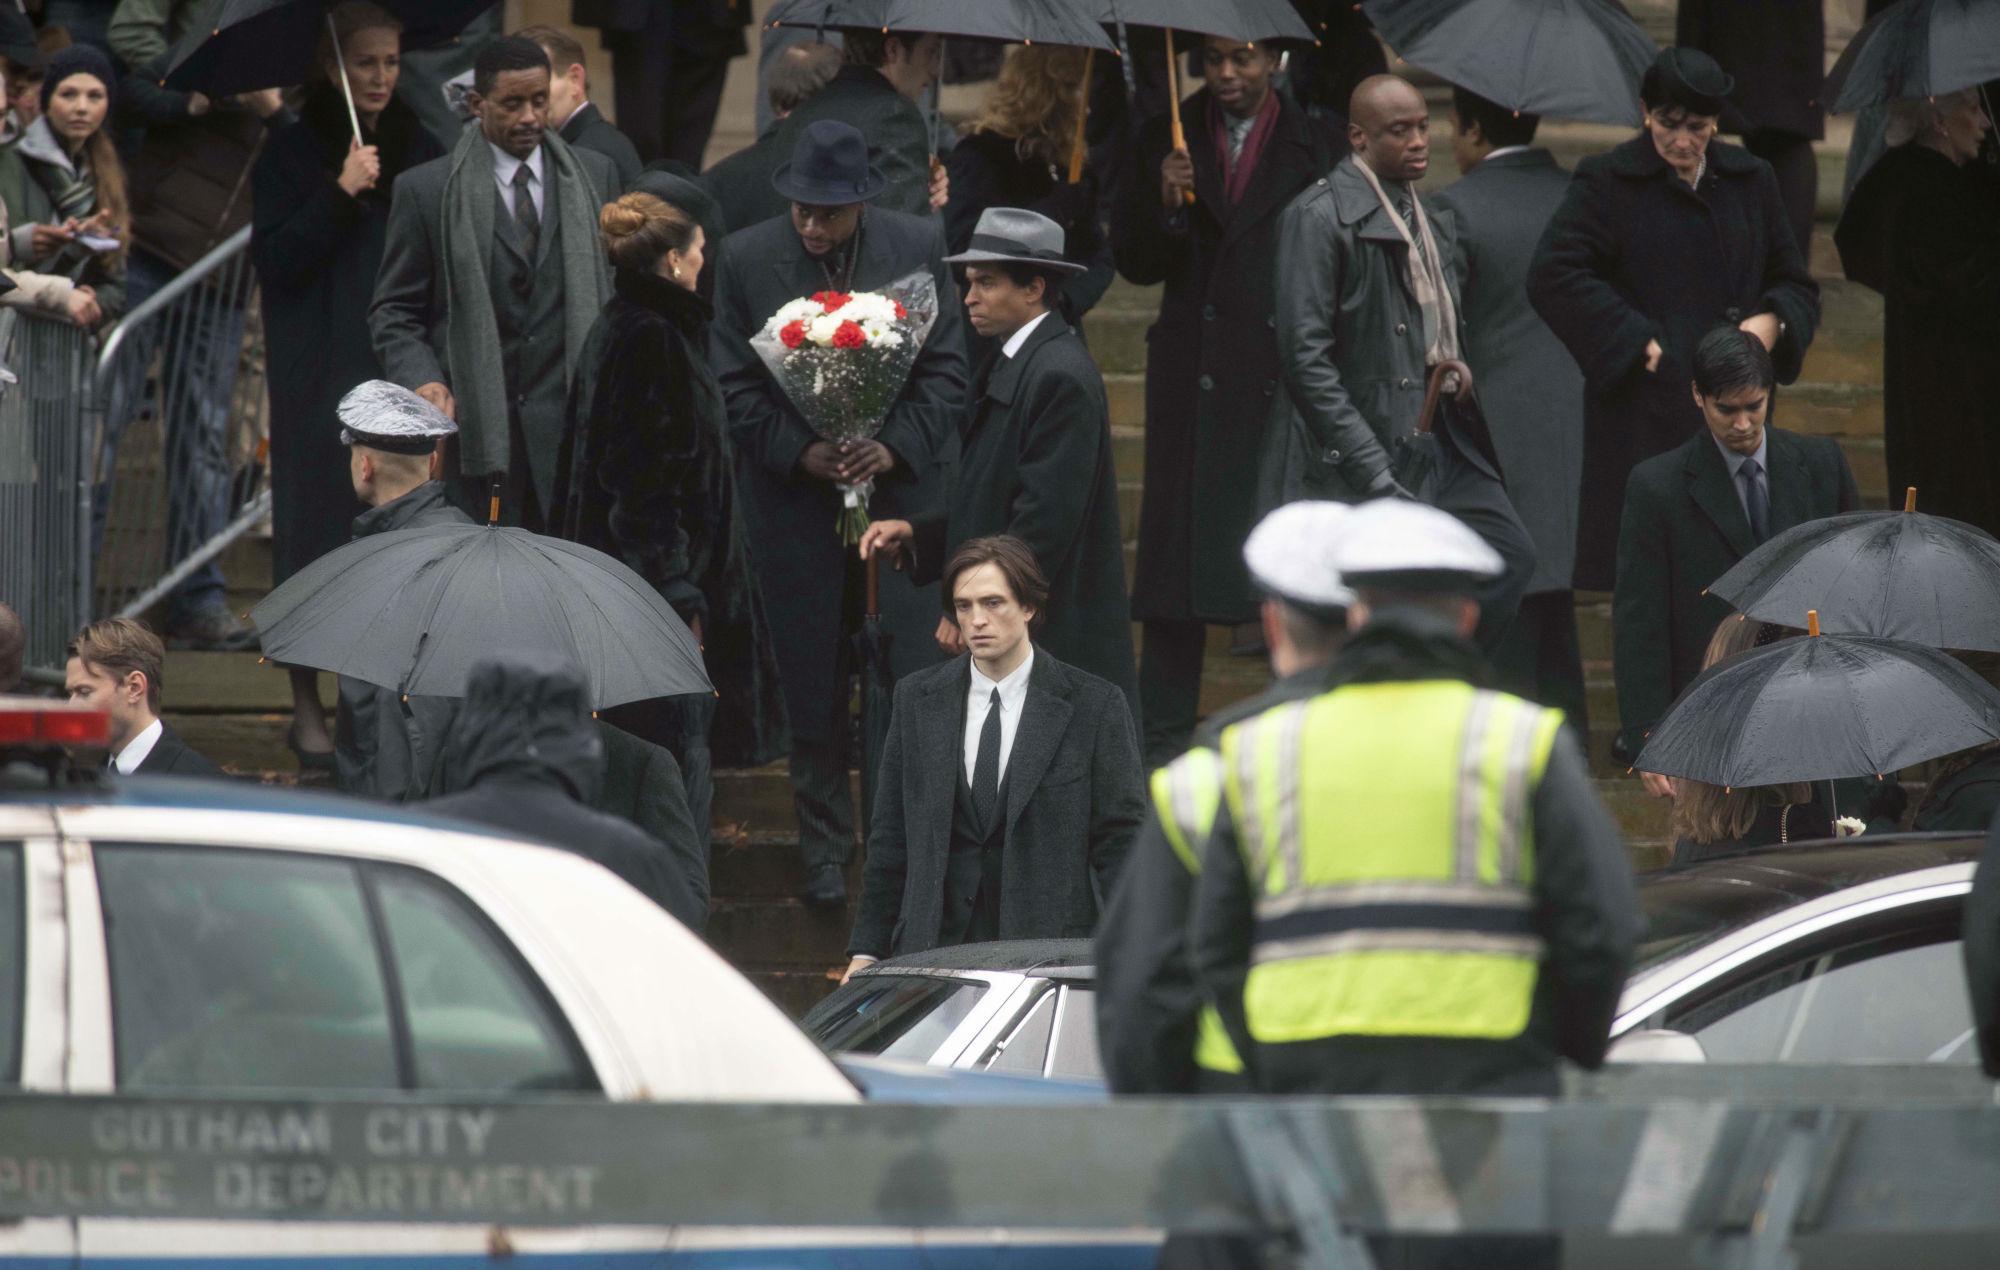 Robert Pattinson filming 'The Batman' in Liverpool